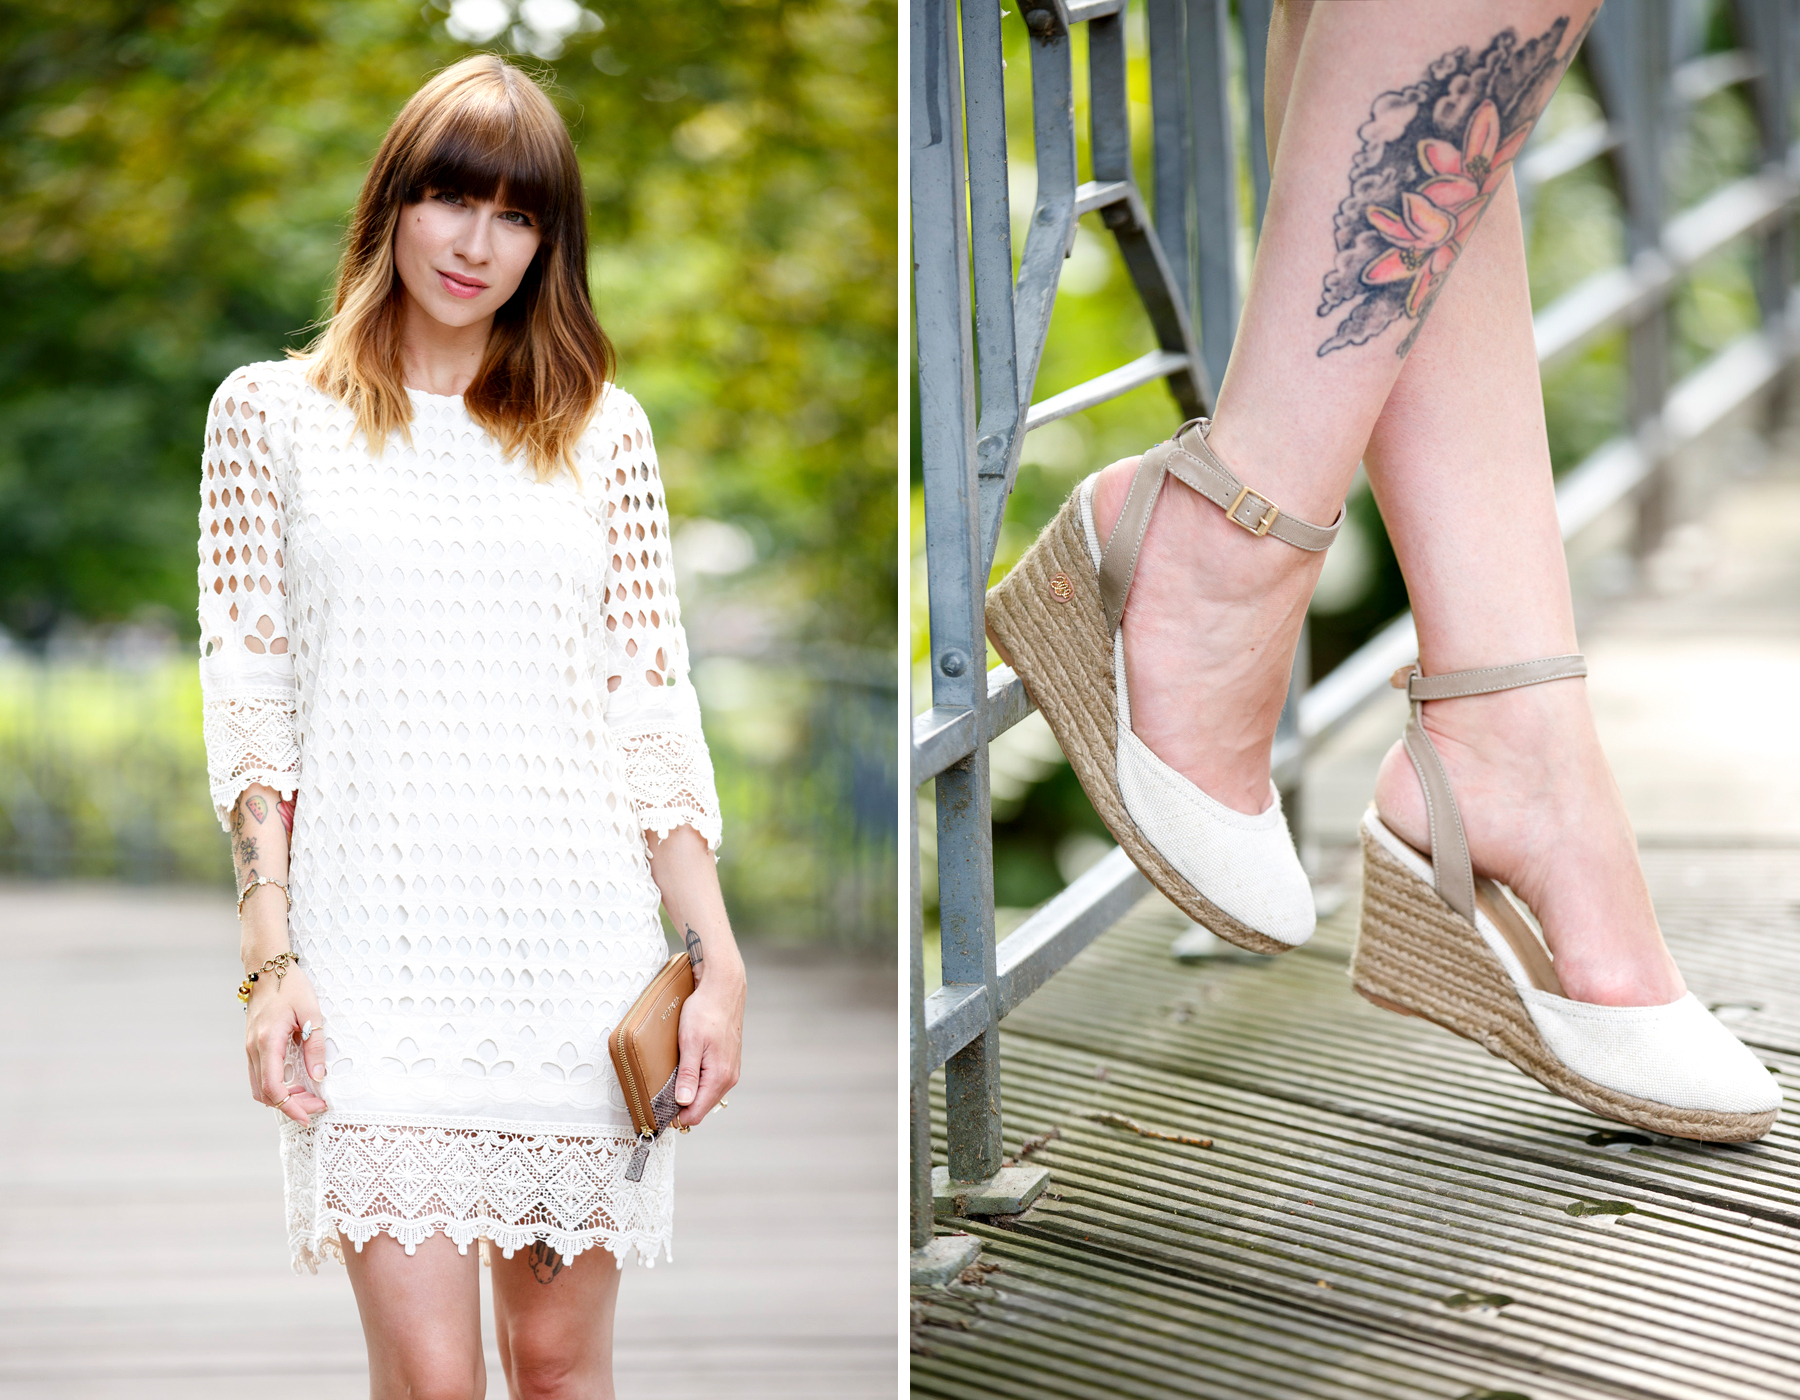 dress-for-less outfit styling white sommerkleid summer look crochet wrangler hilfiger fashion blog germany düsseldorf ricarda schernus cats & dogs 4